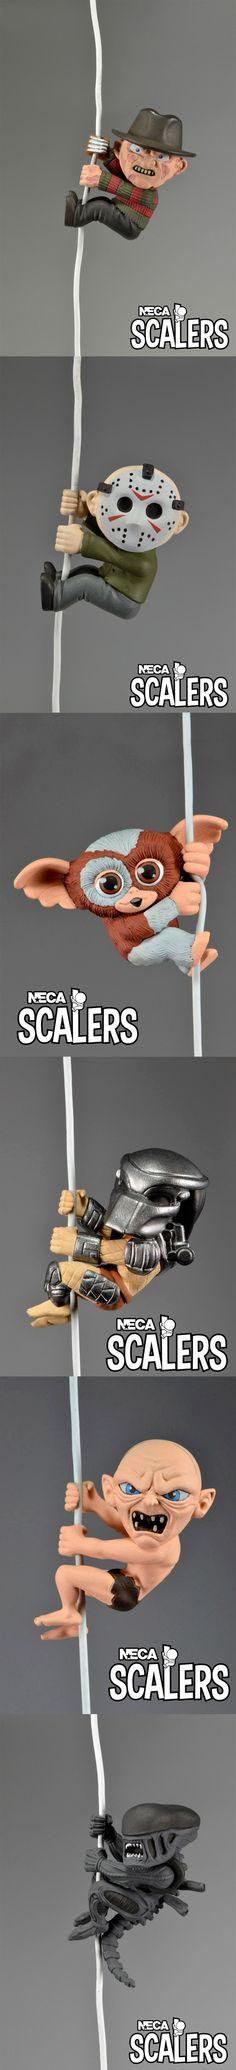 Scalers de NECA